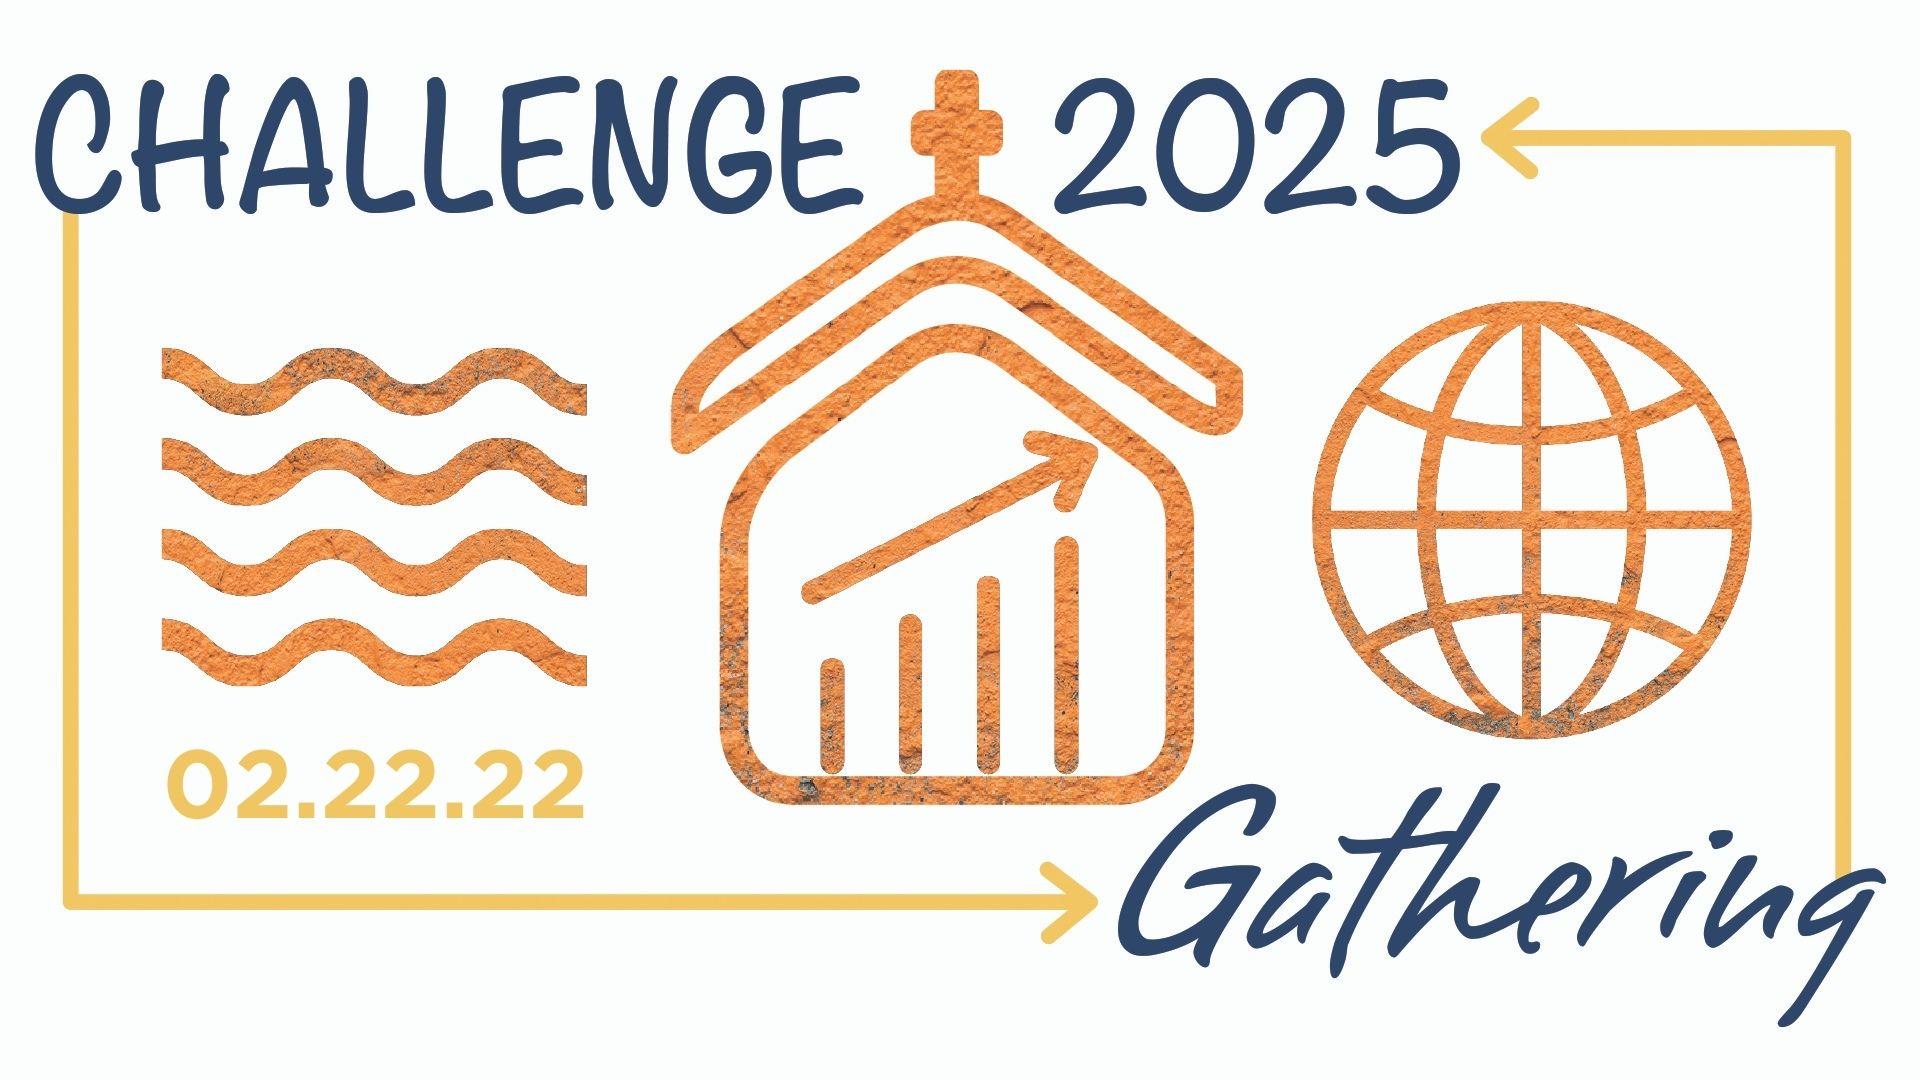 Challenge 2025 Gathering